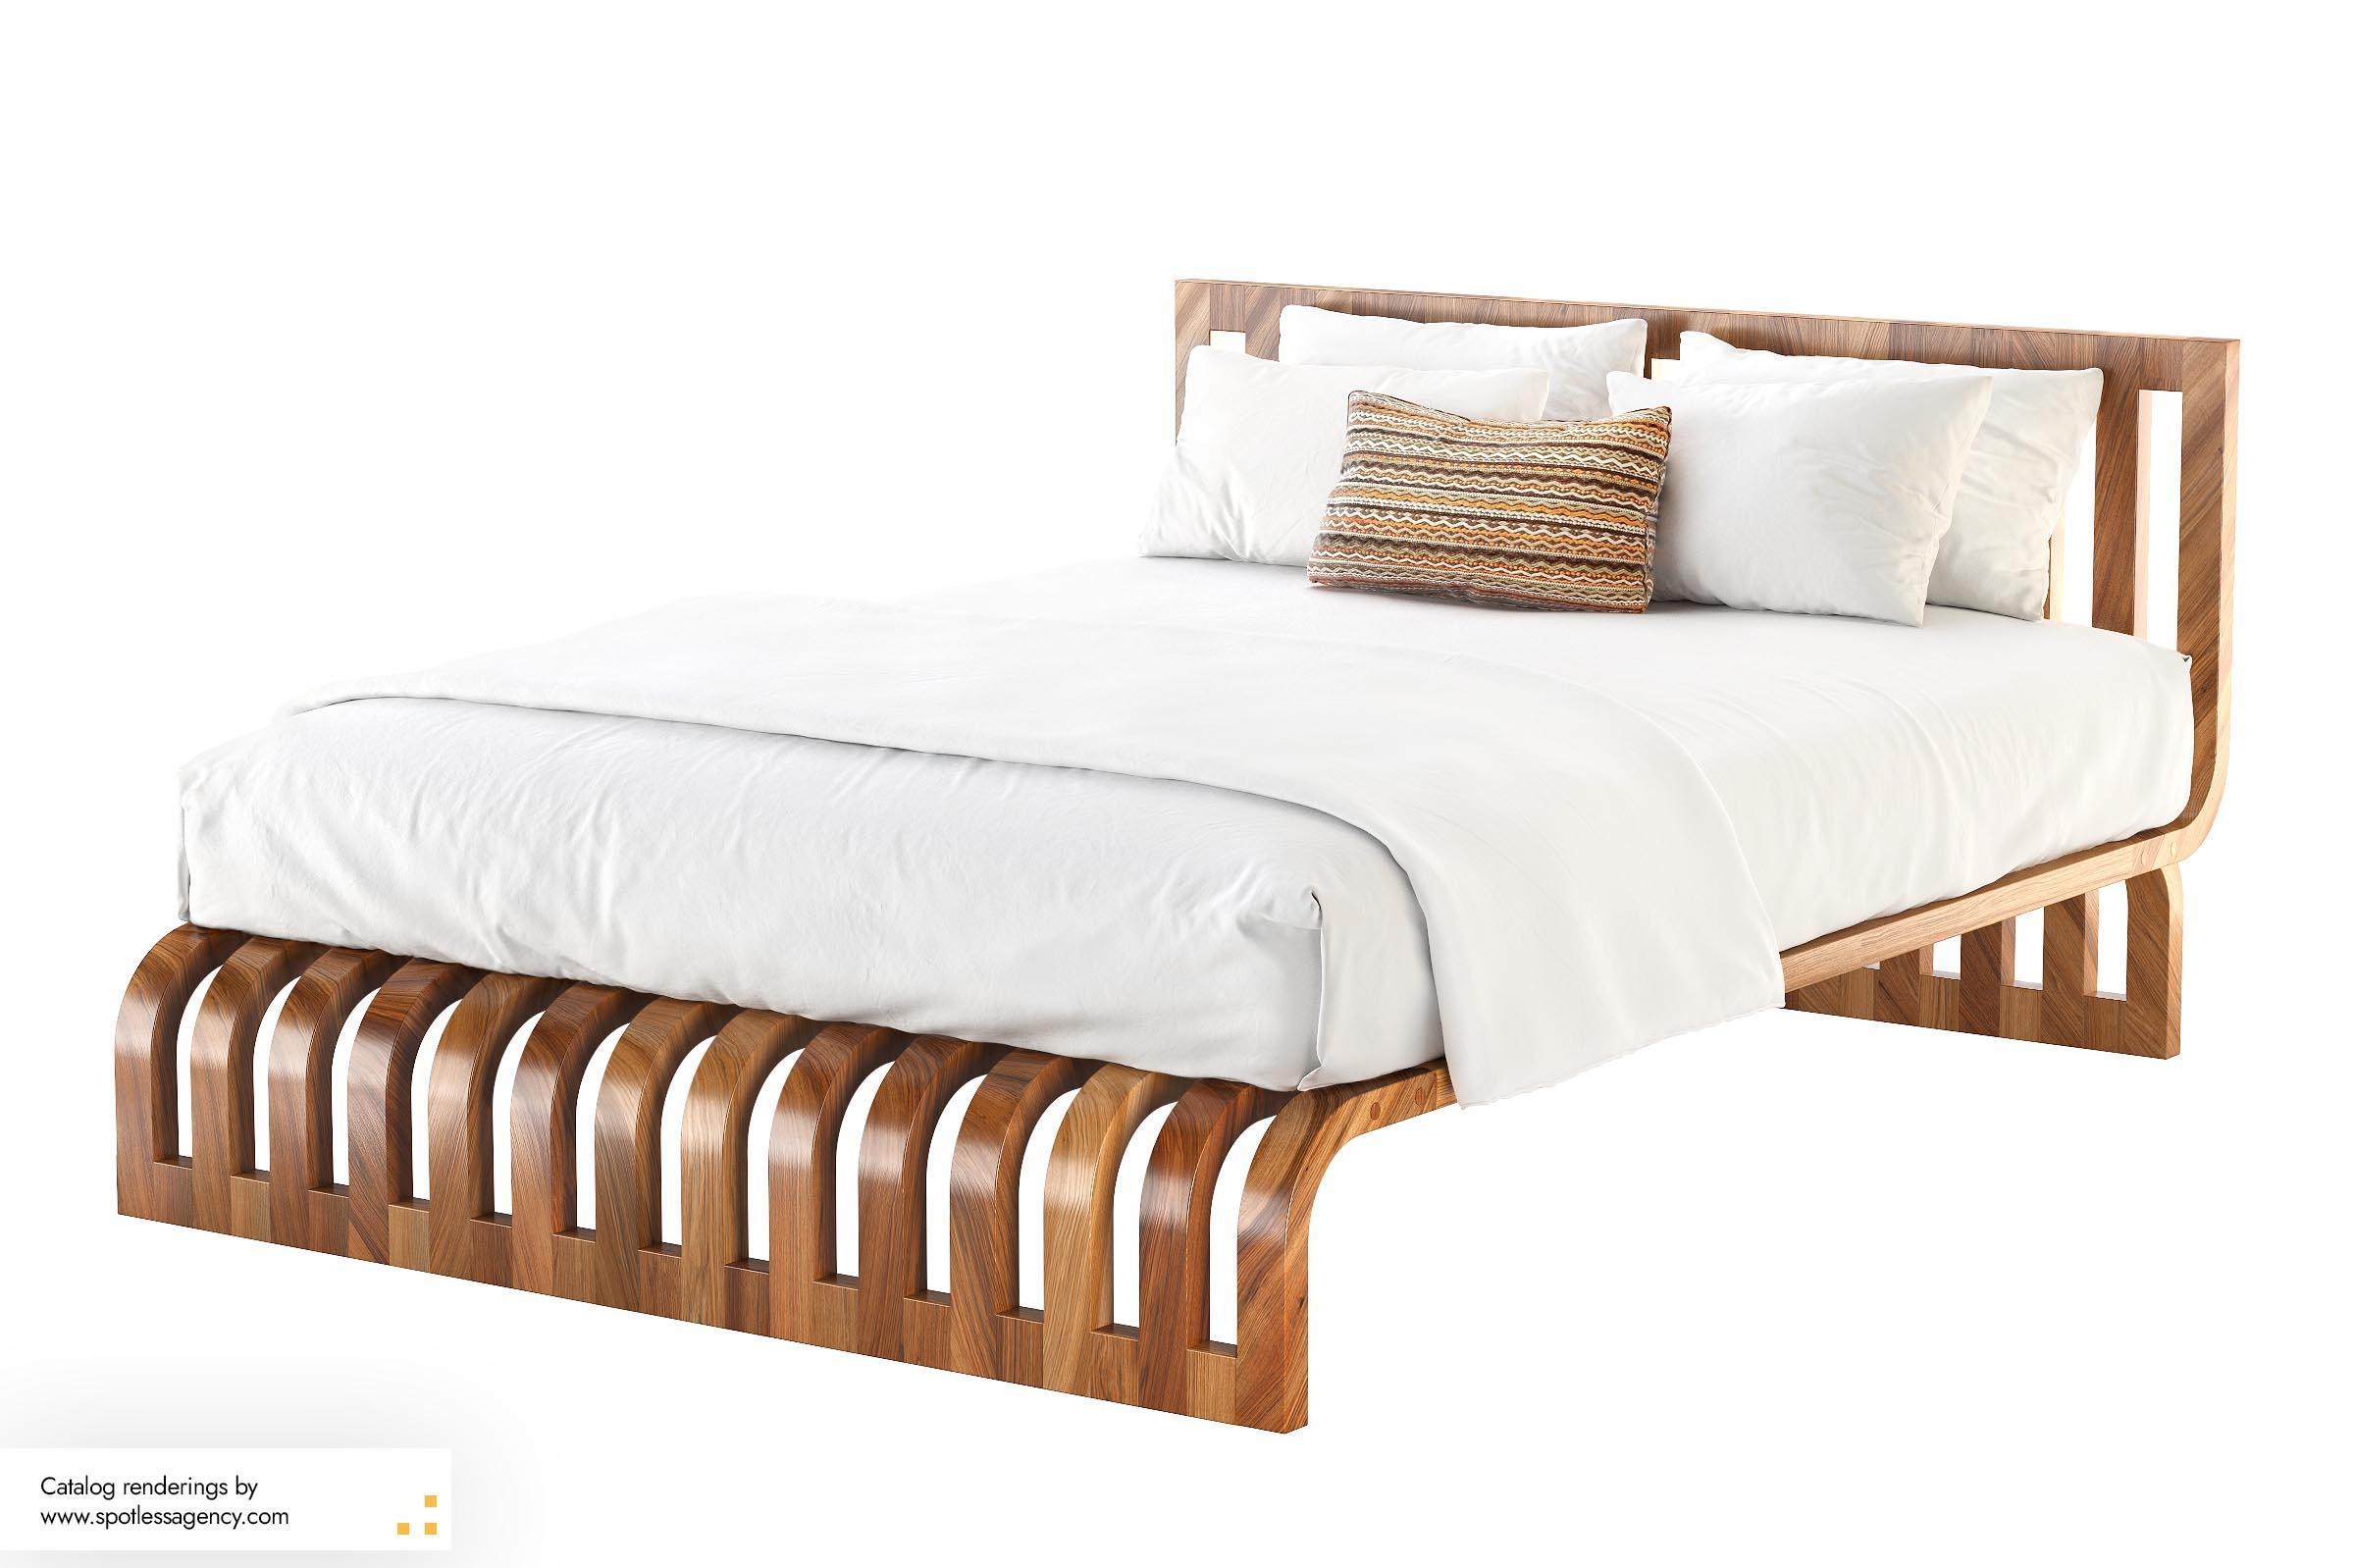 Bed Rendering 4